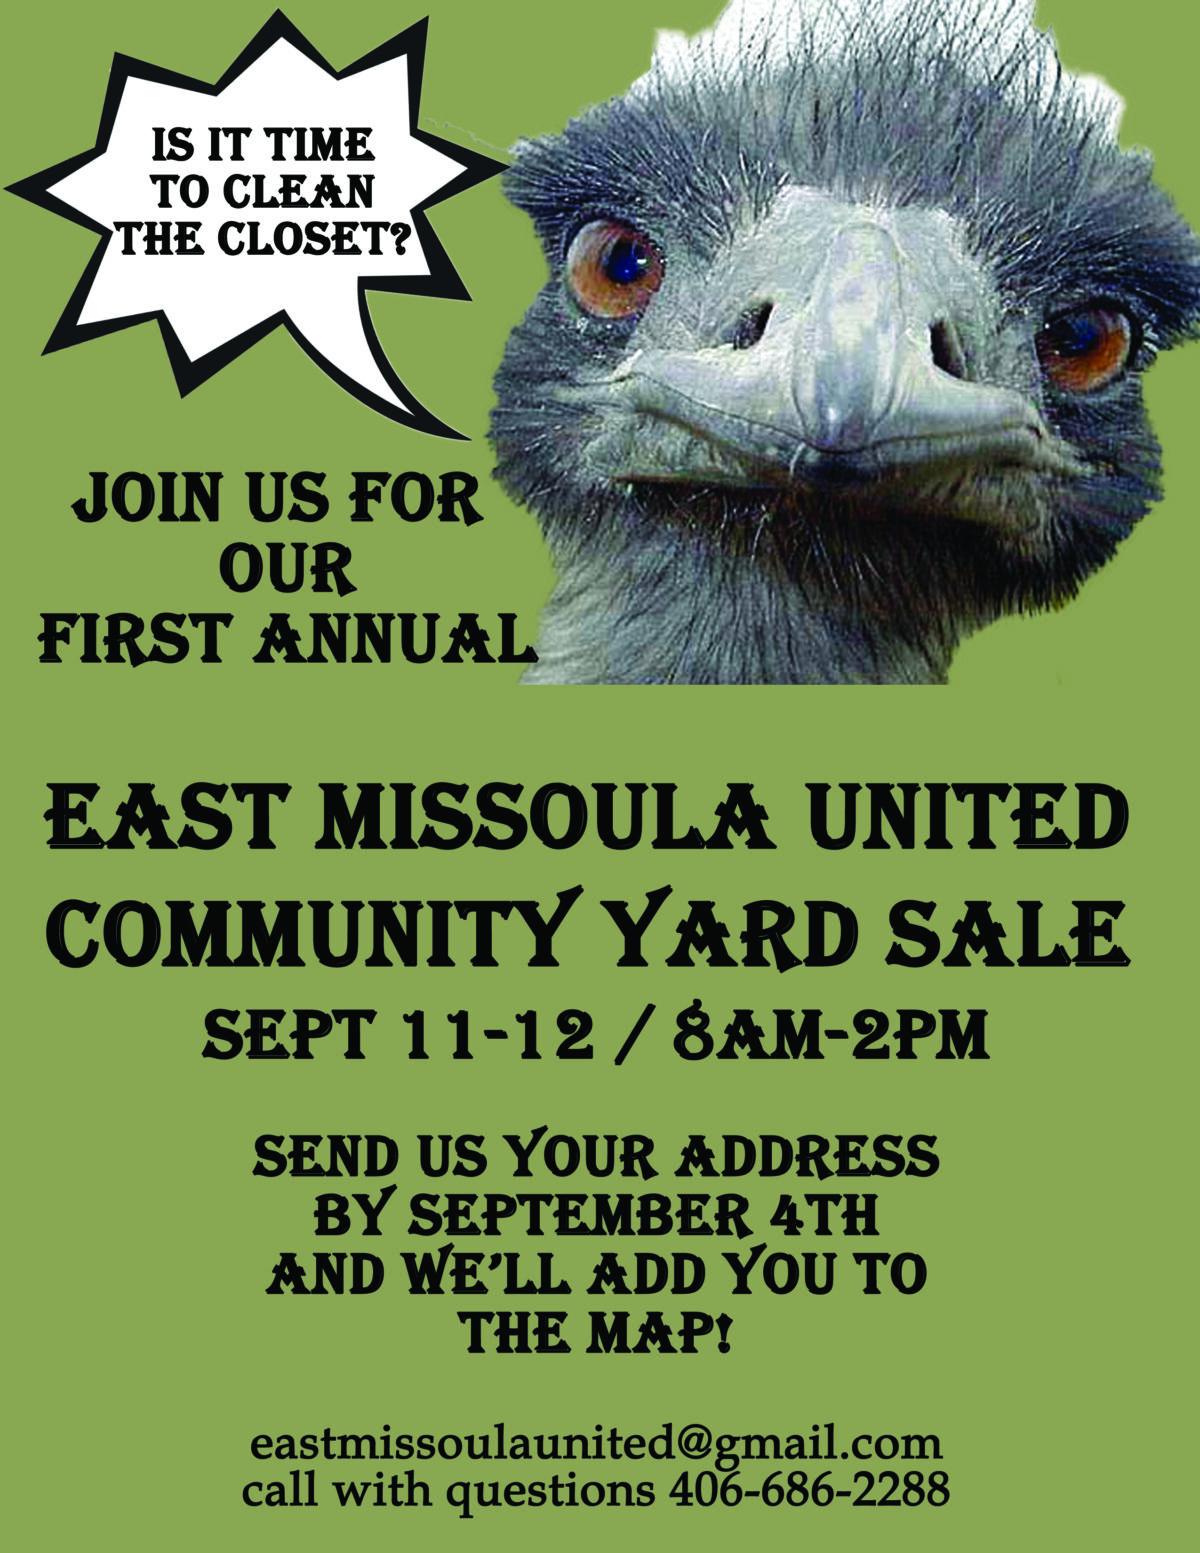 EMU Yard Sale Flyer